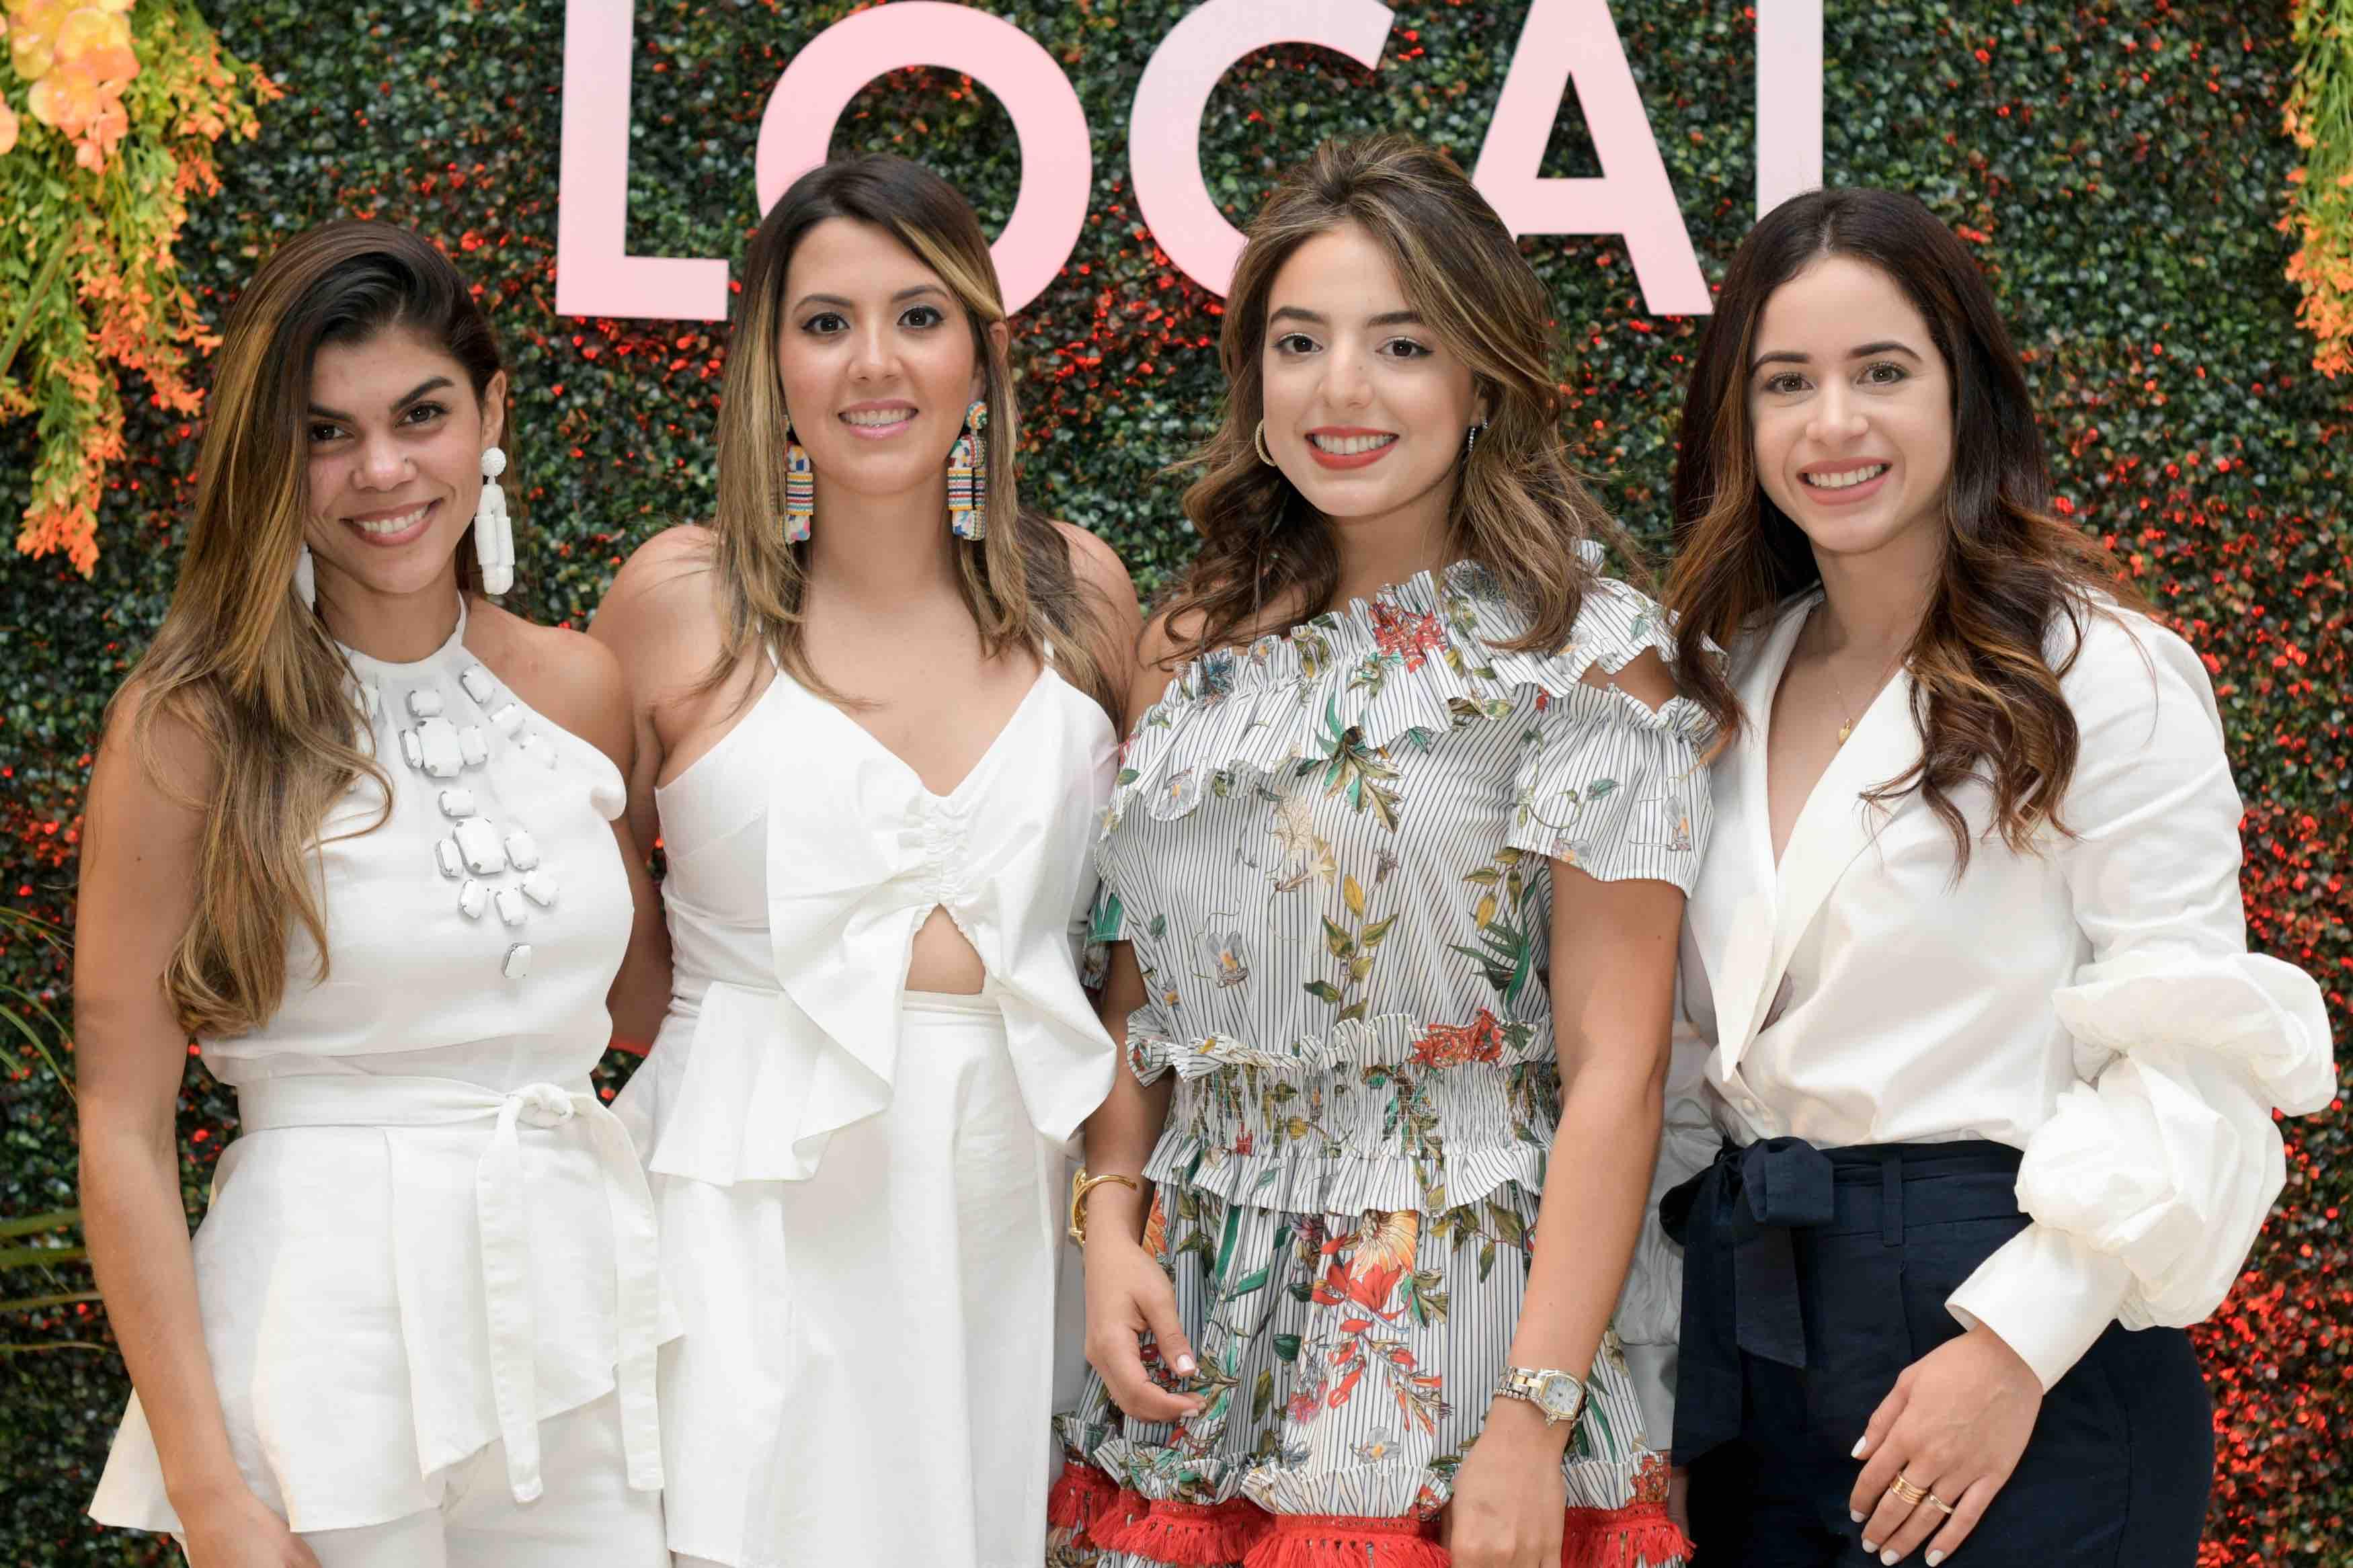 1. Mariel Frias, Paola Santana, Valentina Evertz, Alis Custodia